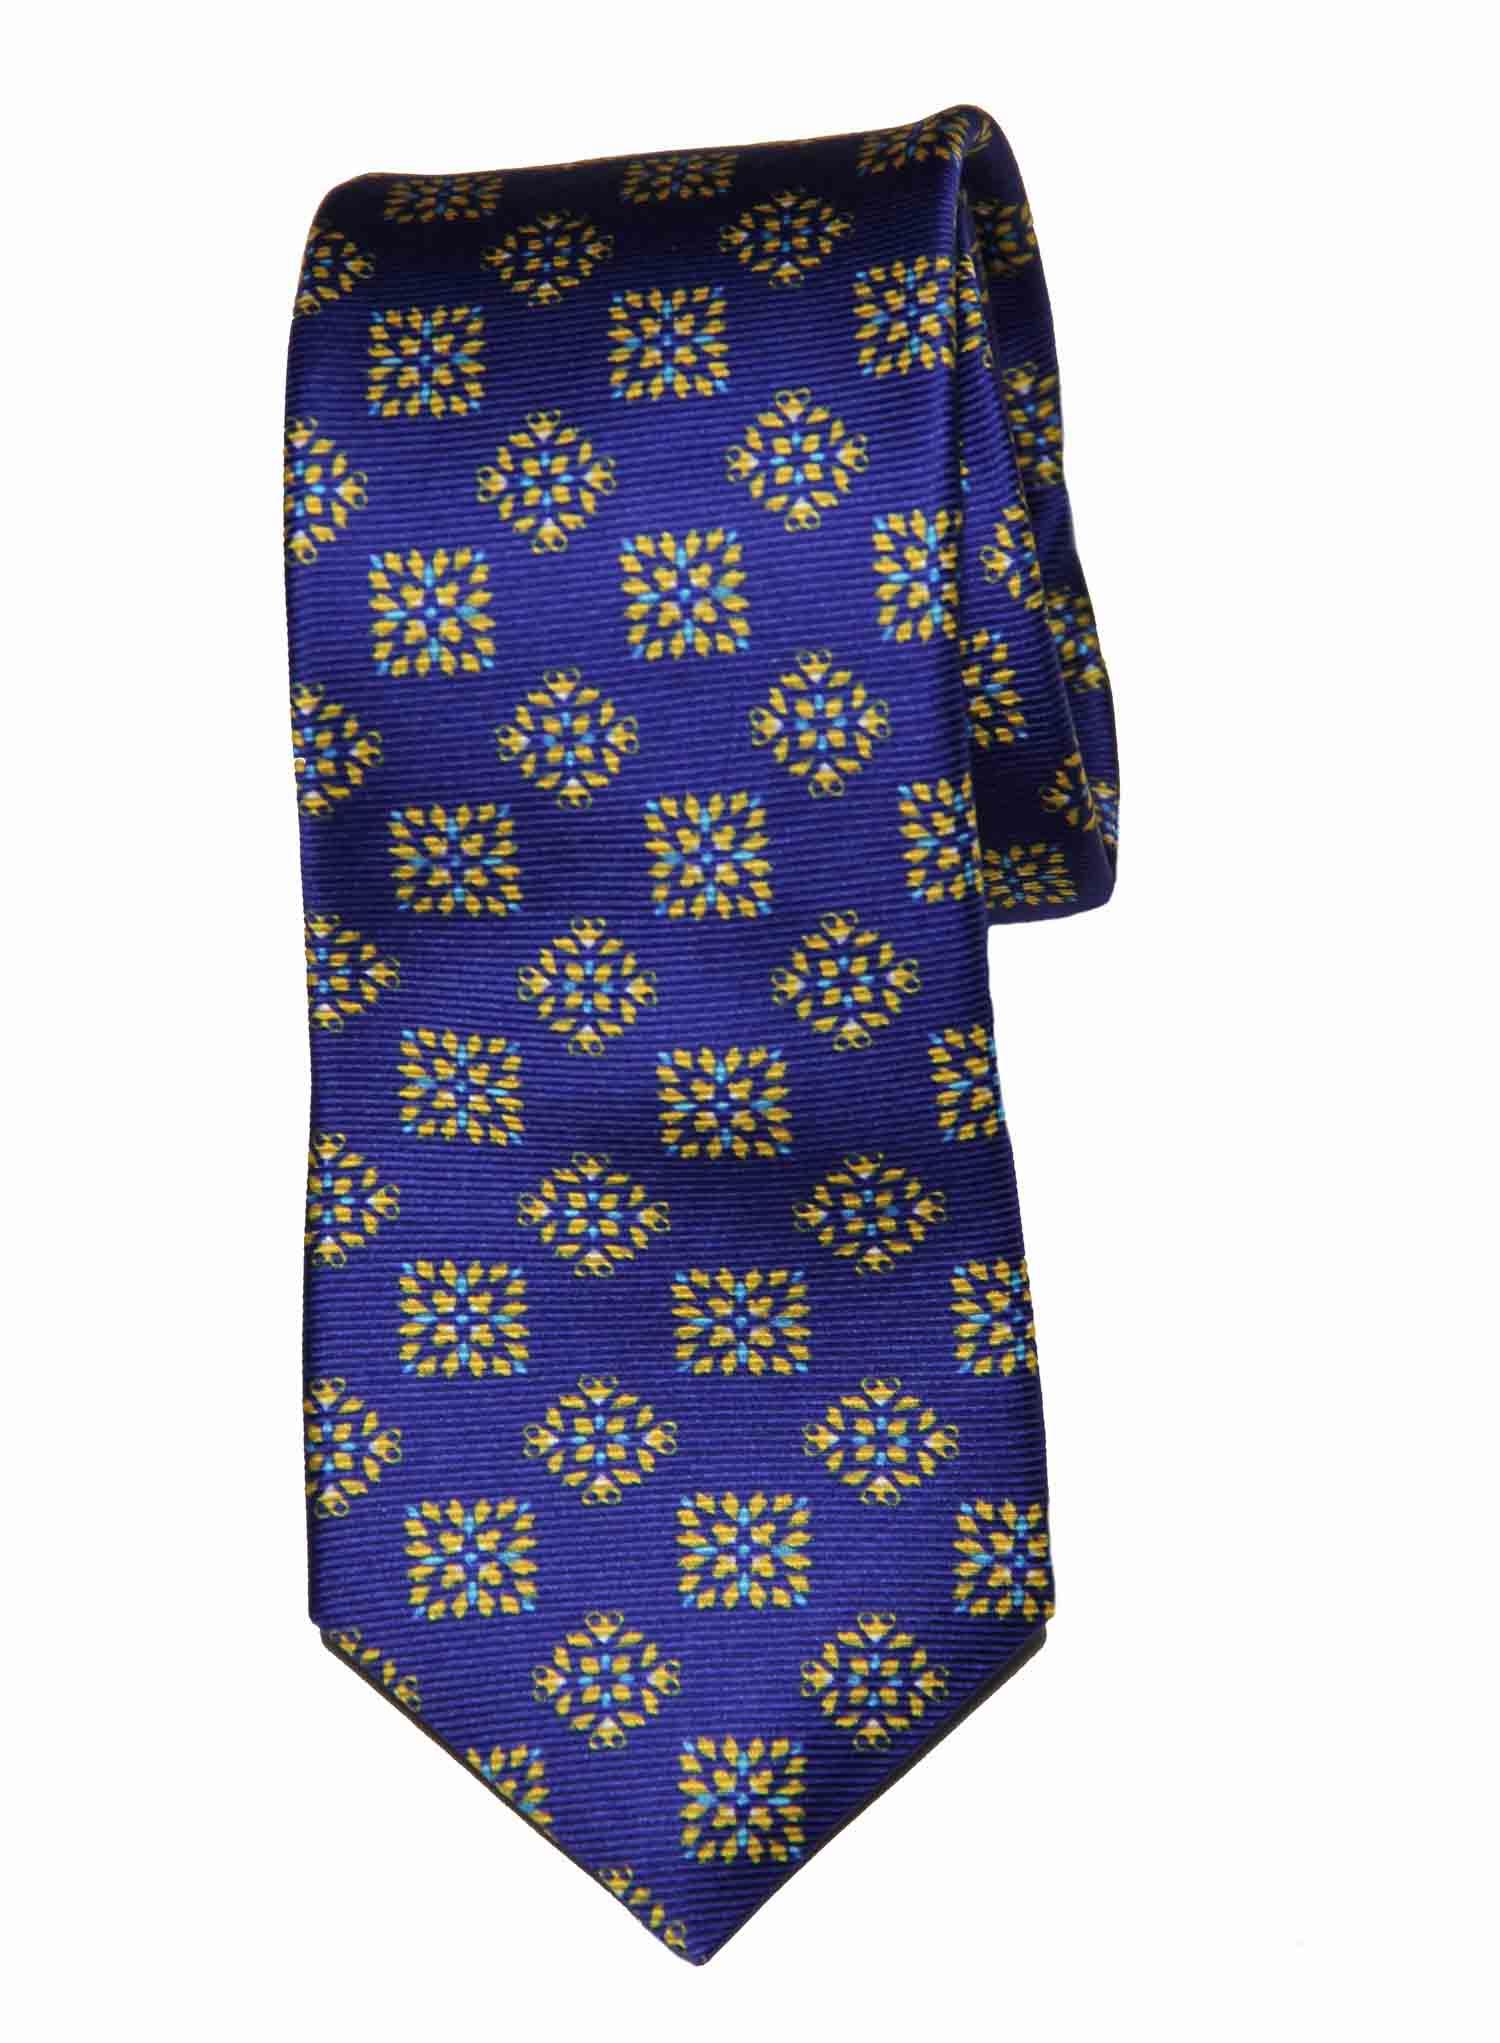 Ted Baker Silk Tie Blue Gold Men's